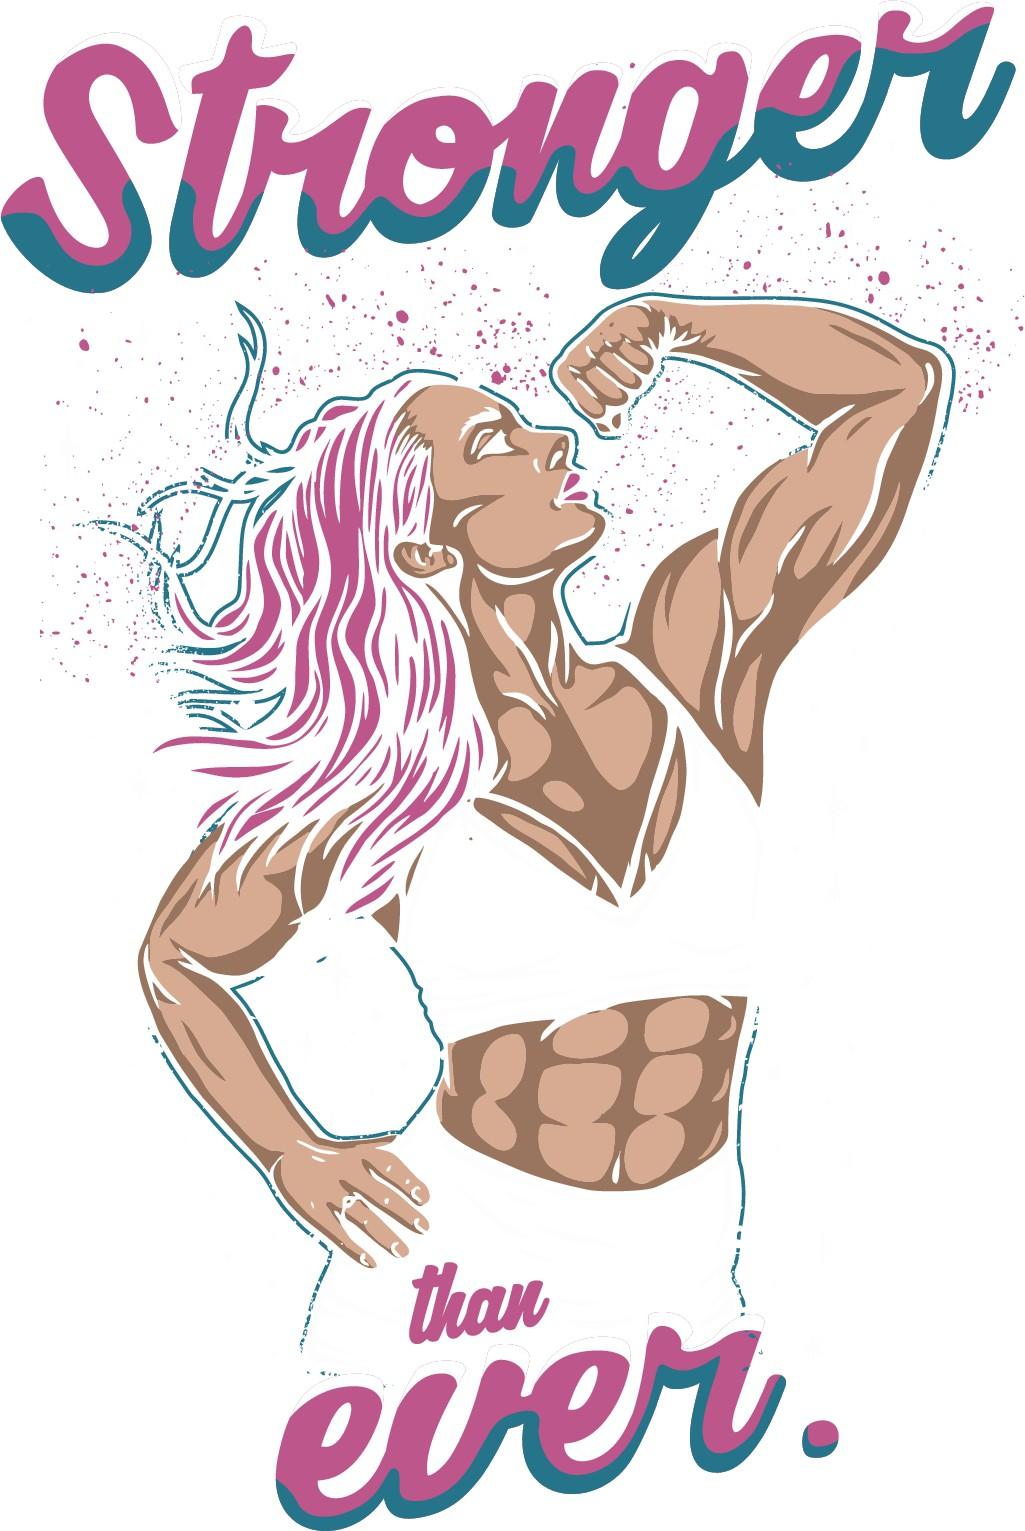 Retro Inspired T-Shirt - For Strong Women!